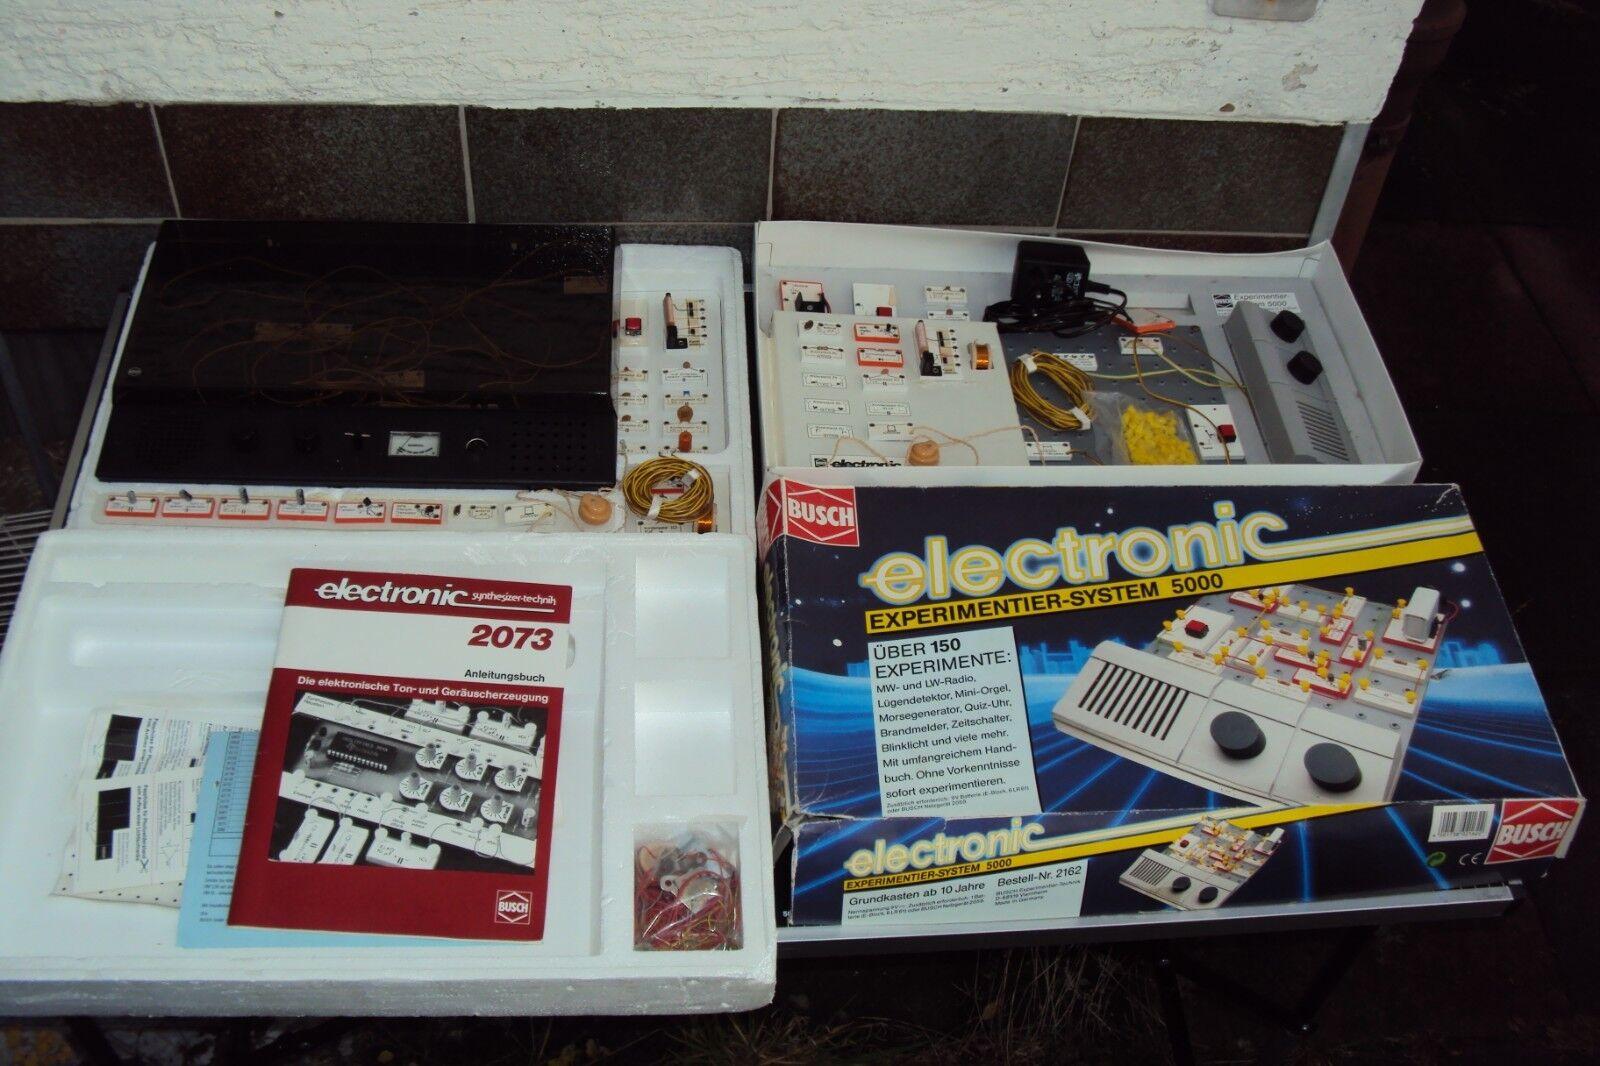 Busch Electronic Experimentier System 5000 2073 syntheGrößer-technik usw